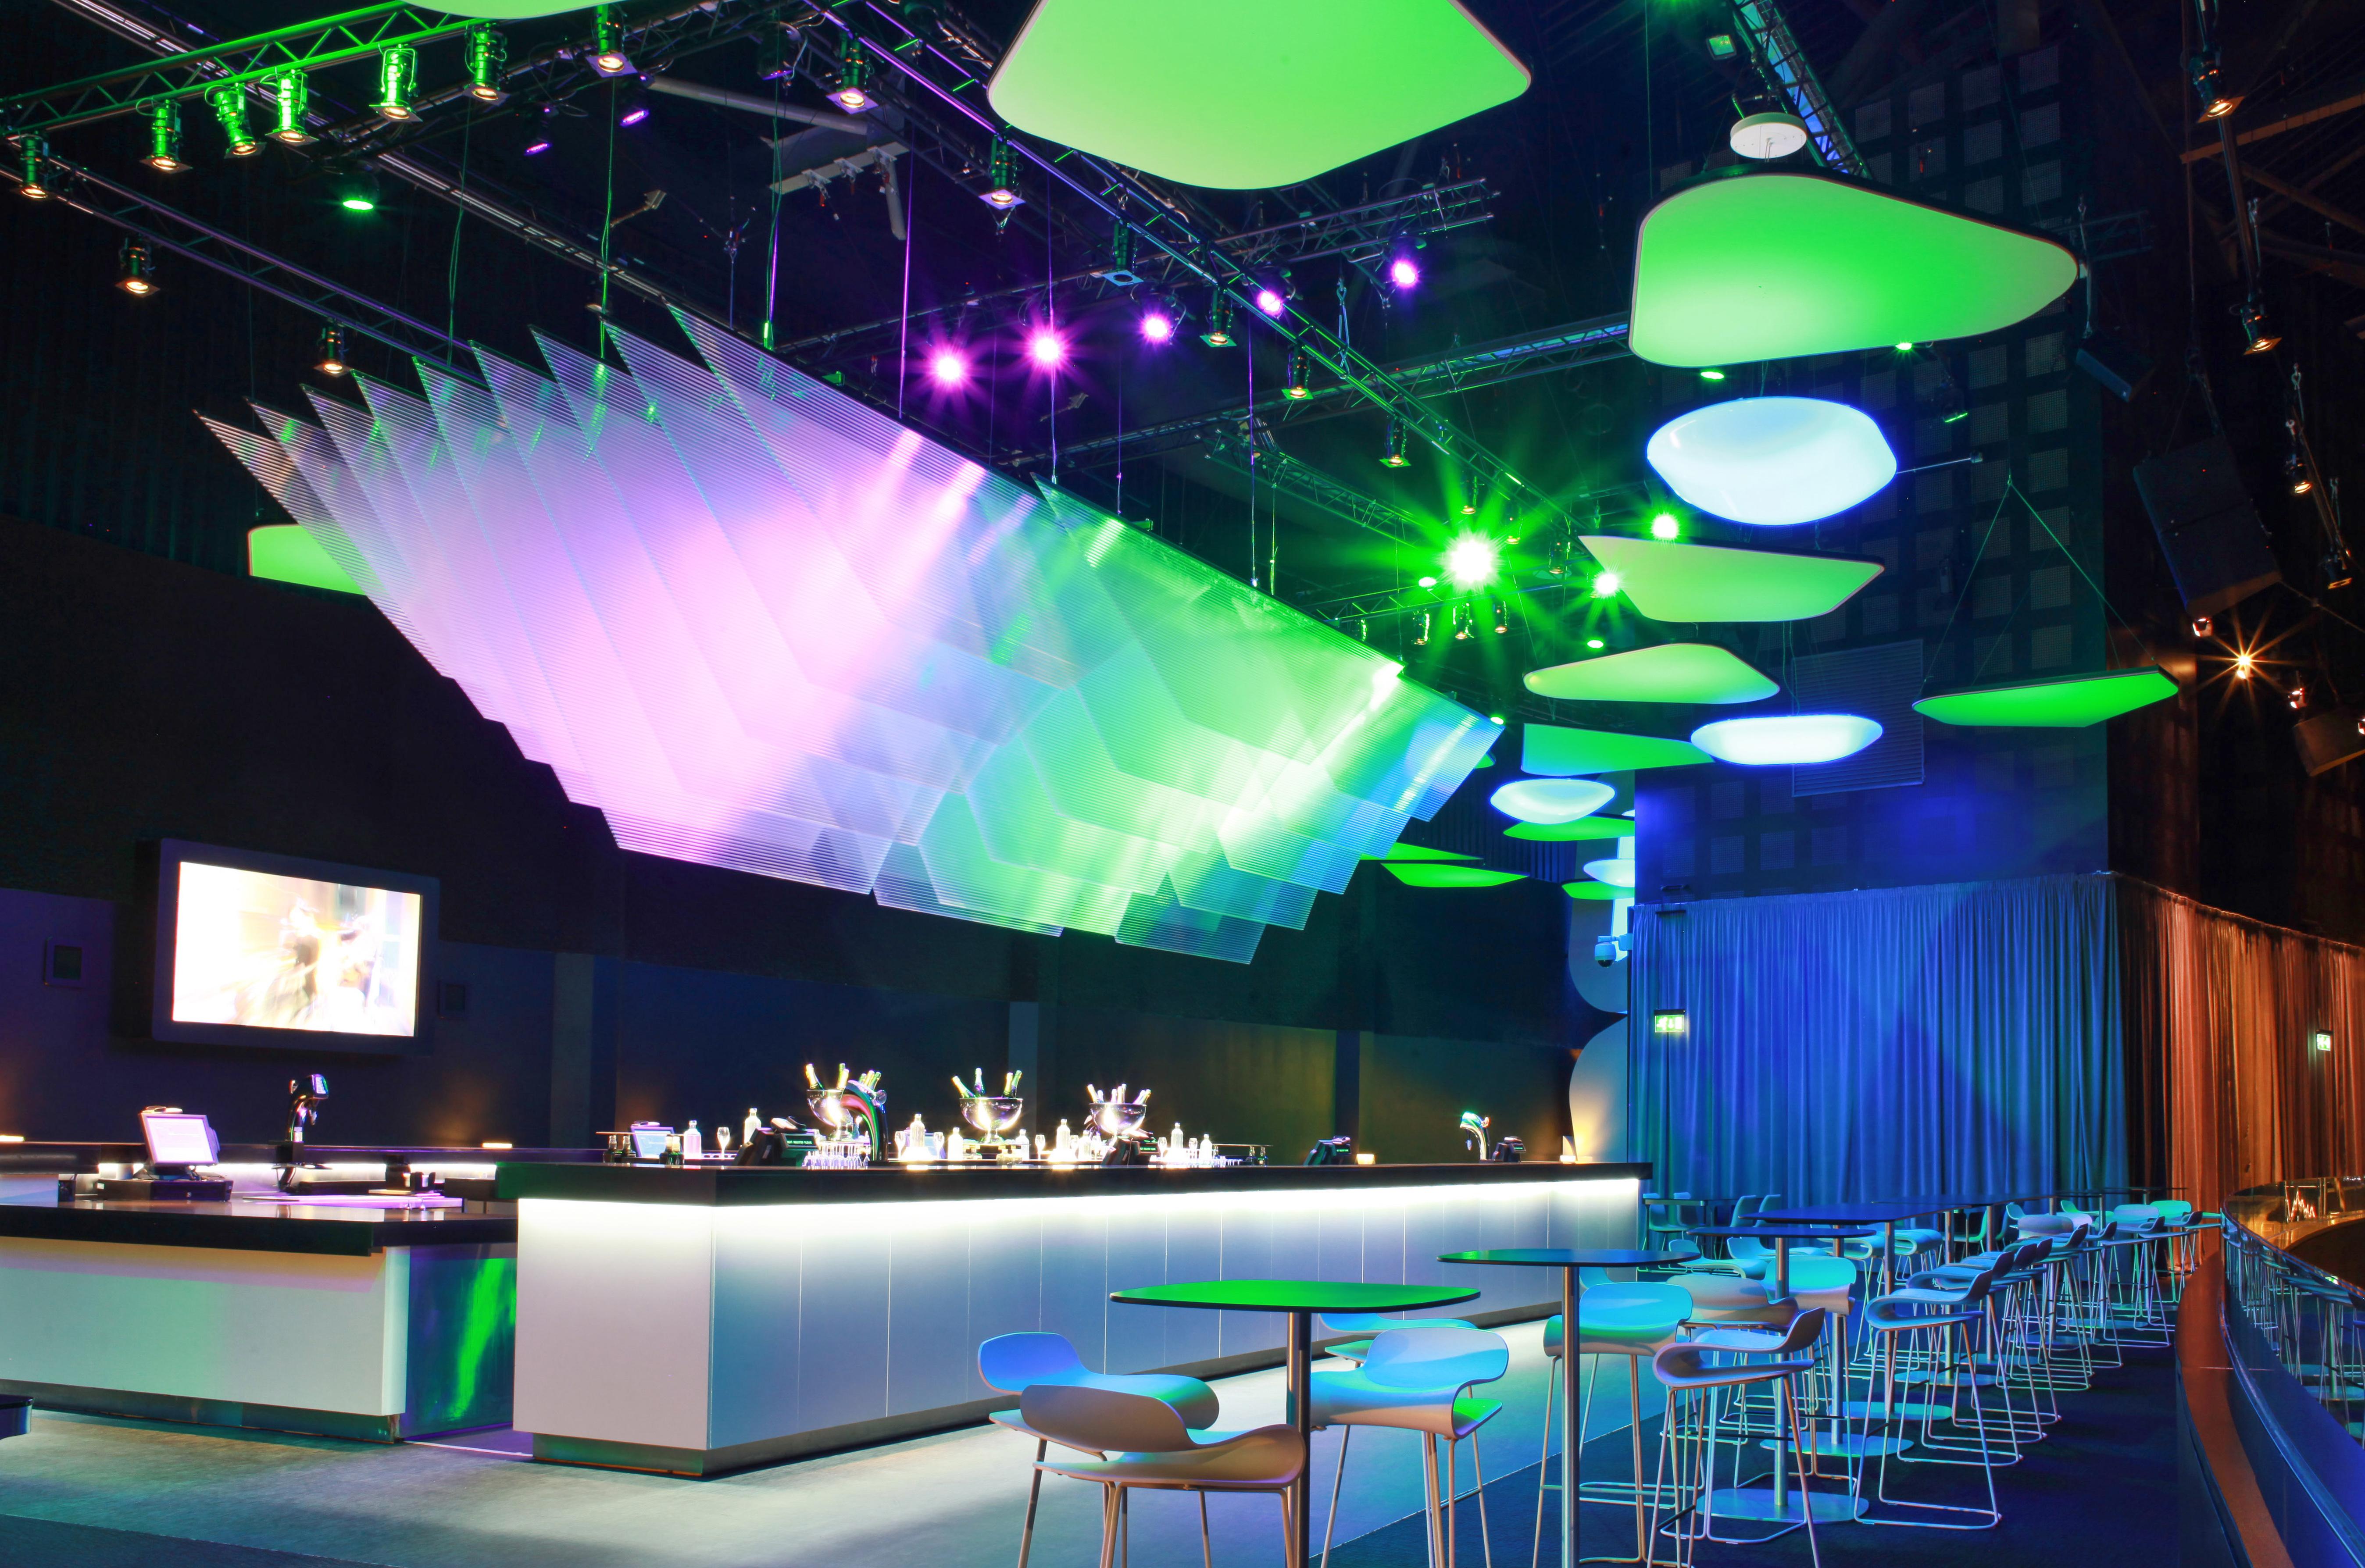 Sky_BackStage_0Sky bar, backstag04-2